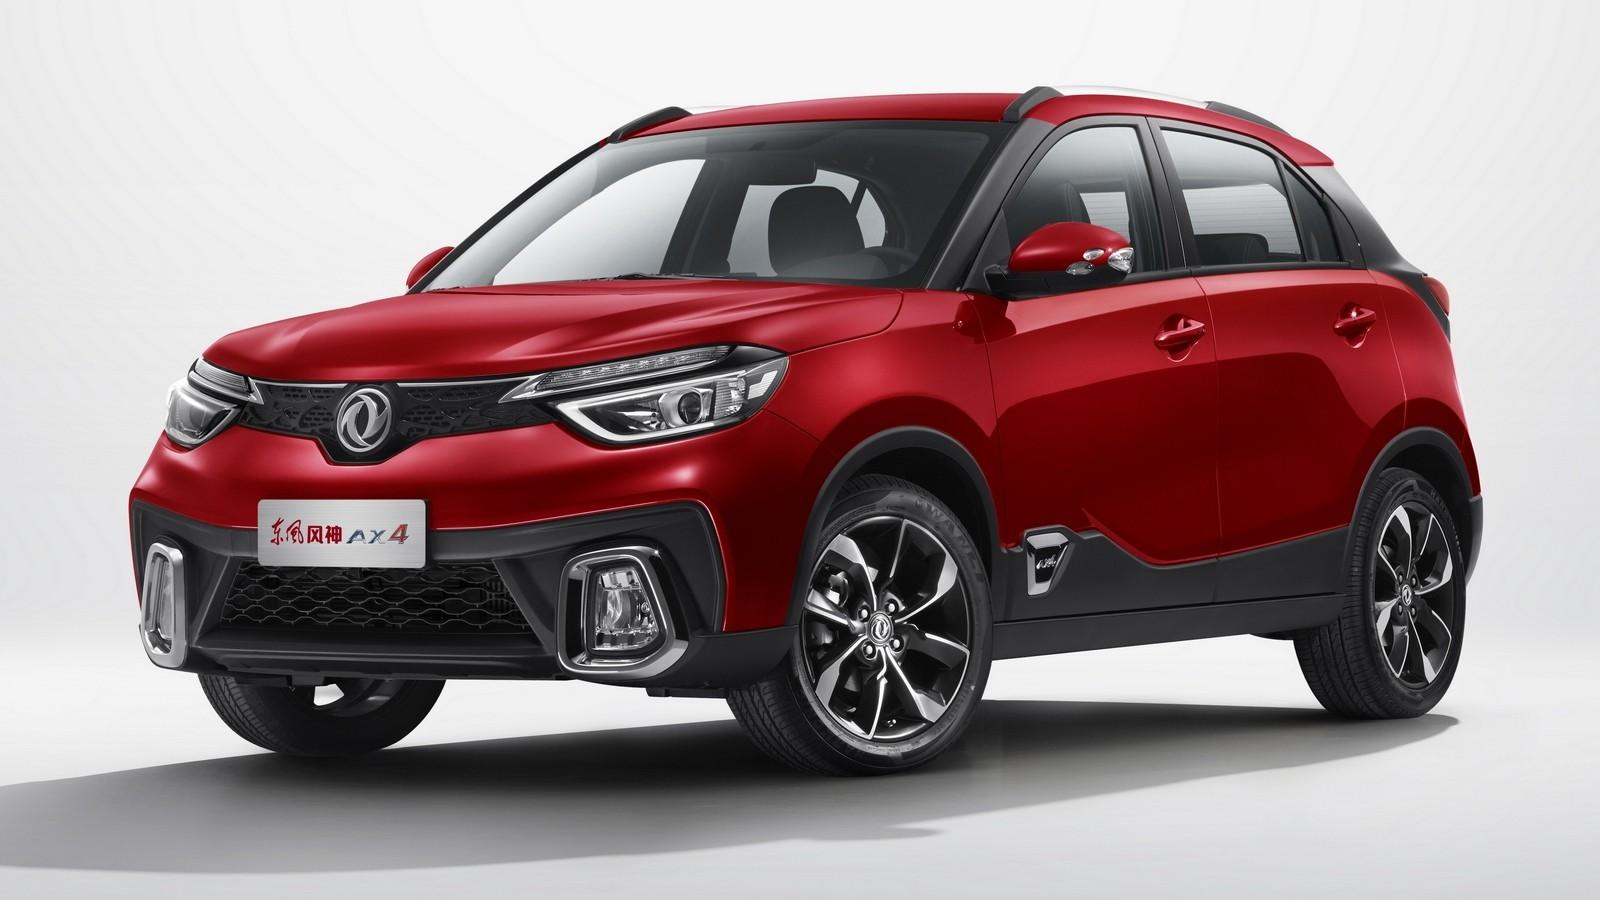 Dongfeng Aeolus AX4 '2017–н.в. красный три четверти